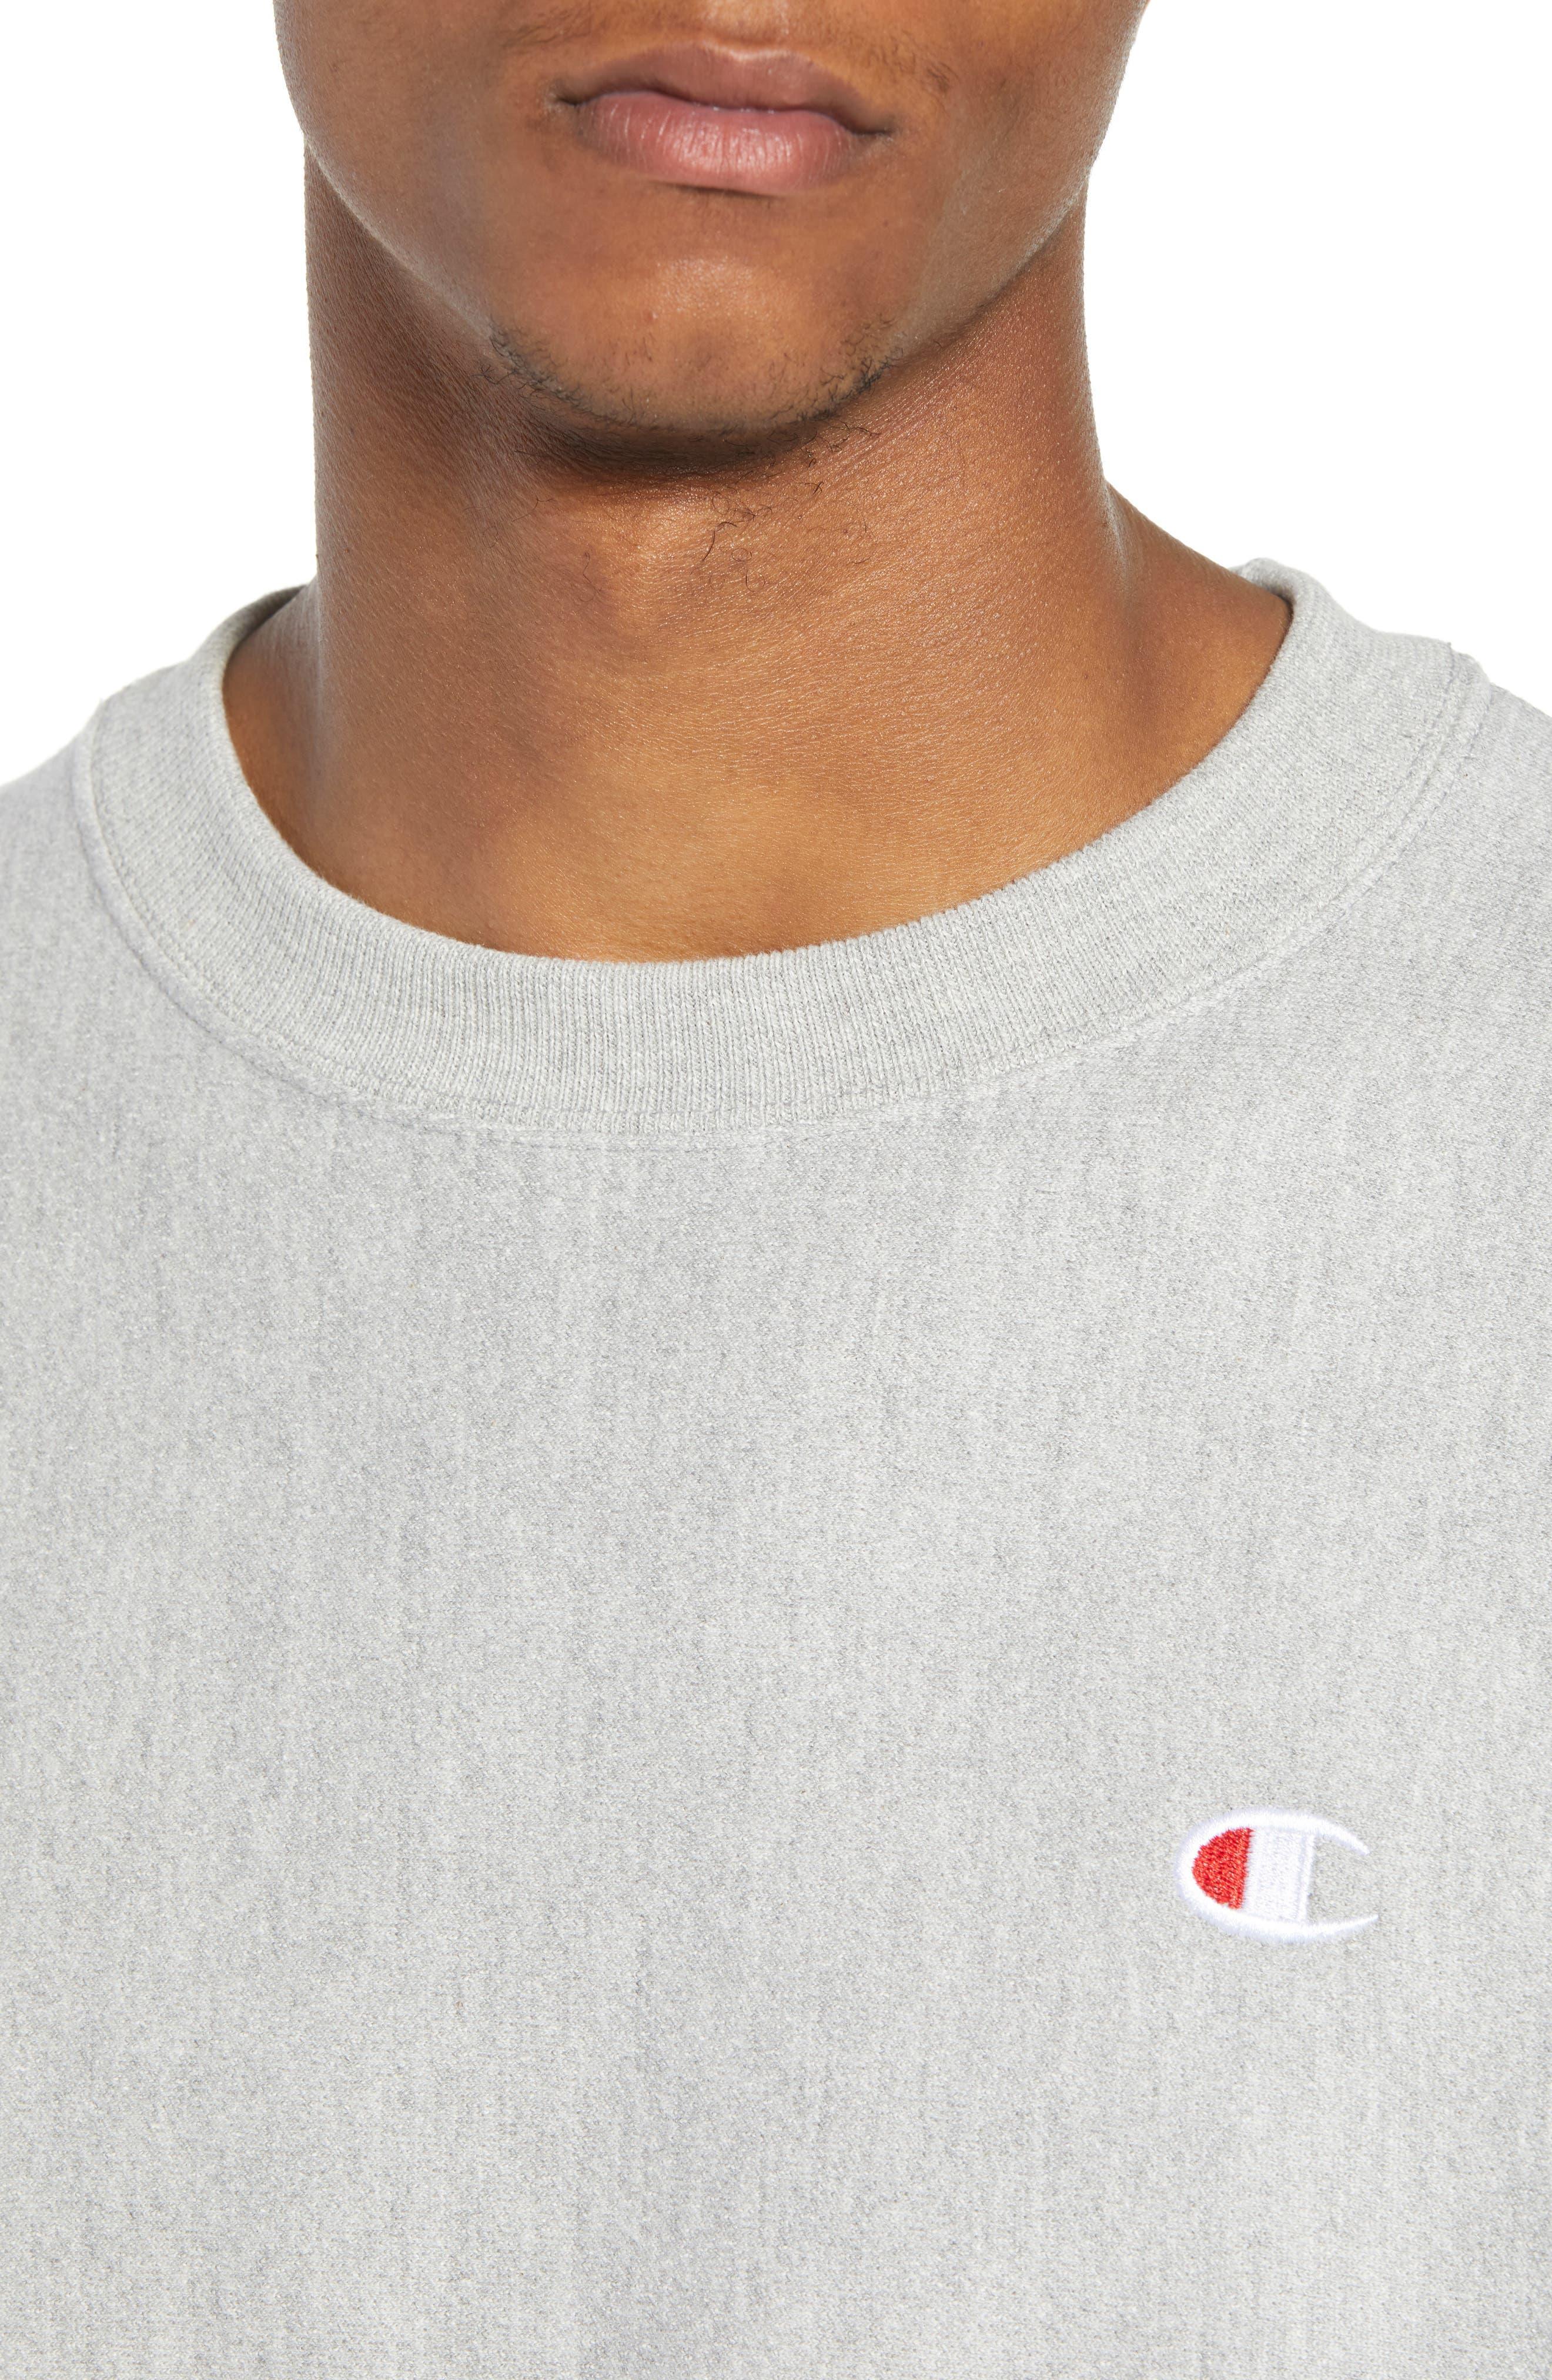 Reverse Weave Sweatshirt,                             Alternate thumbnail 22, color,